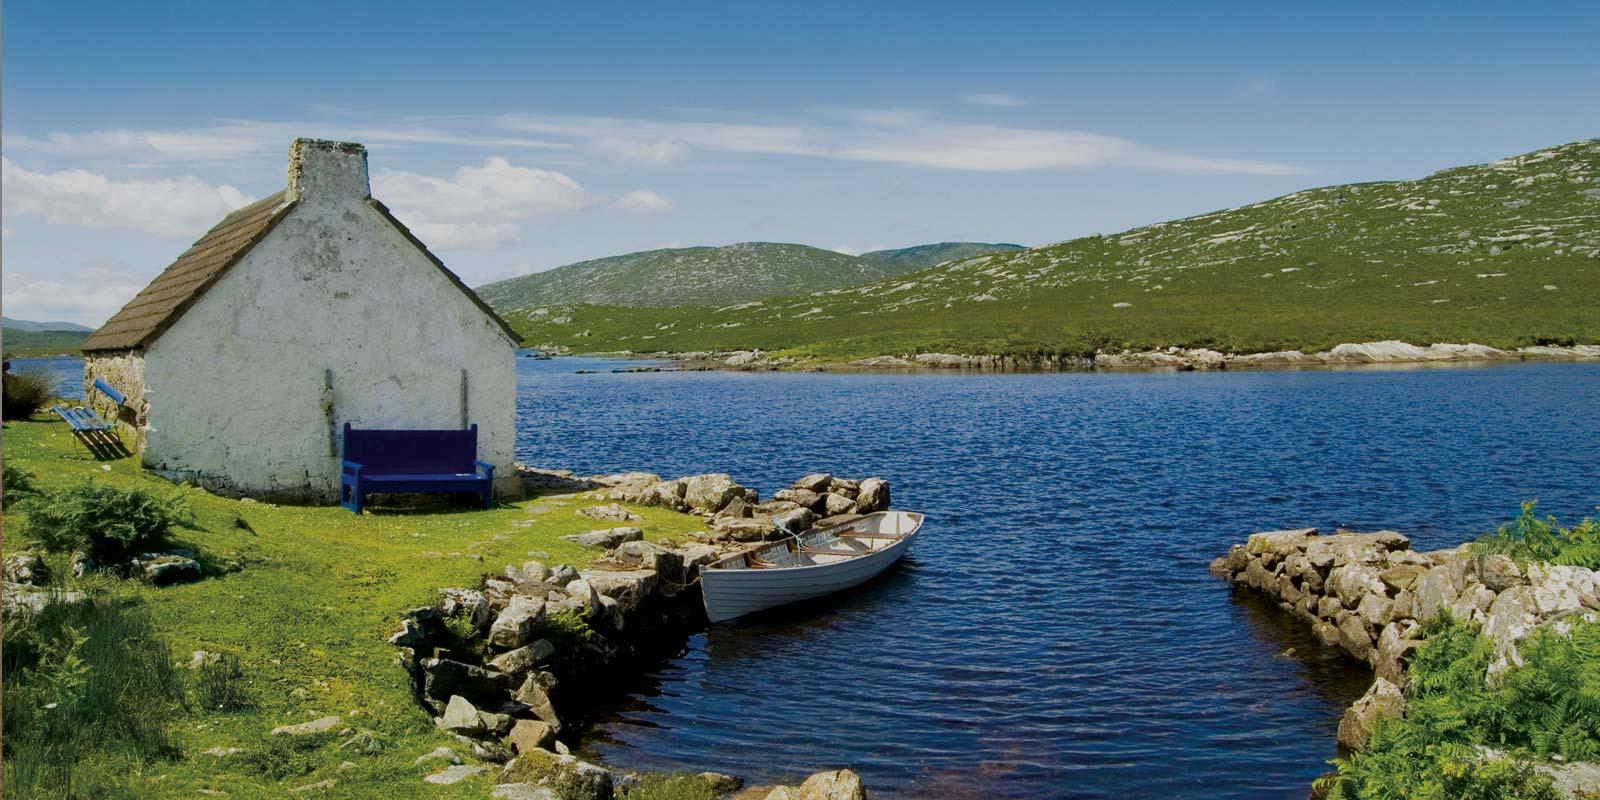 England Ireland And Wales EF Educational Tours - Tours of england